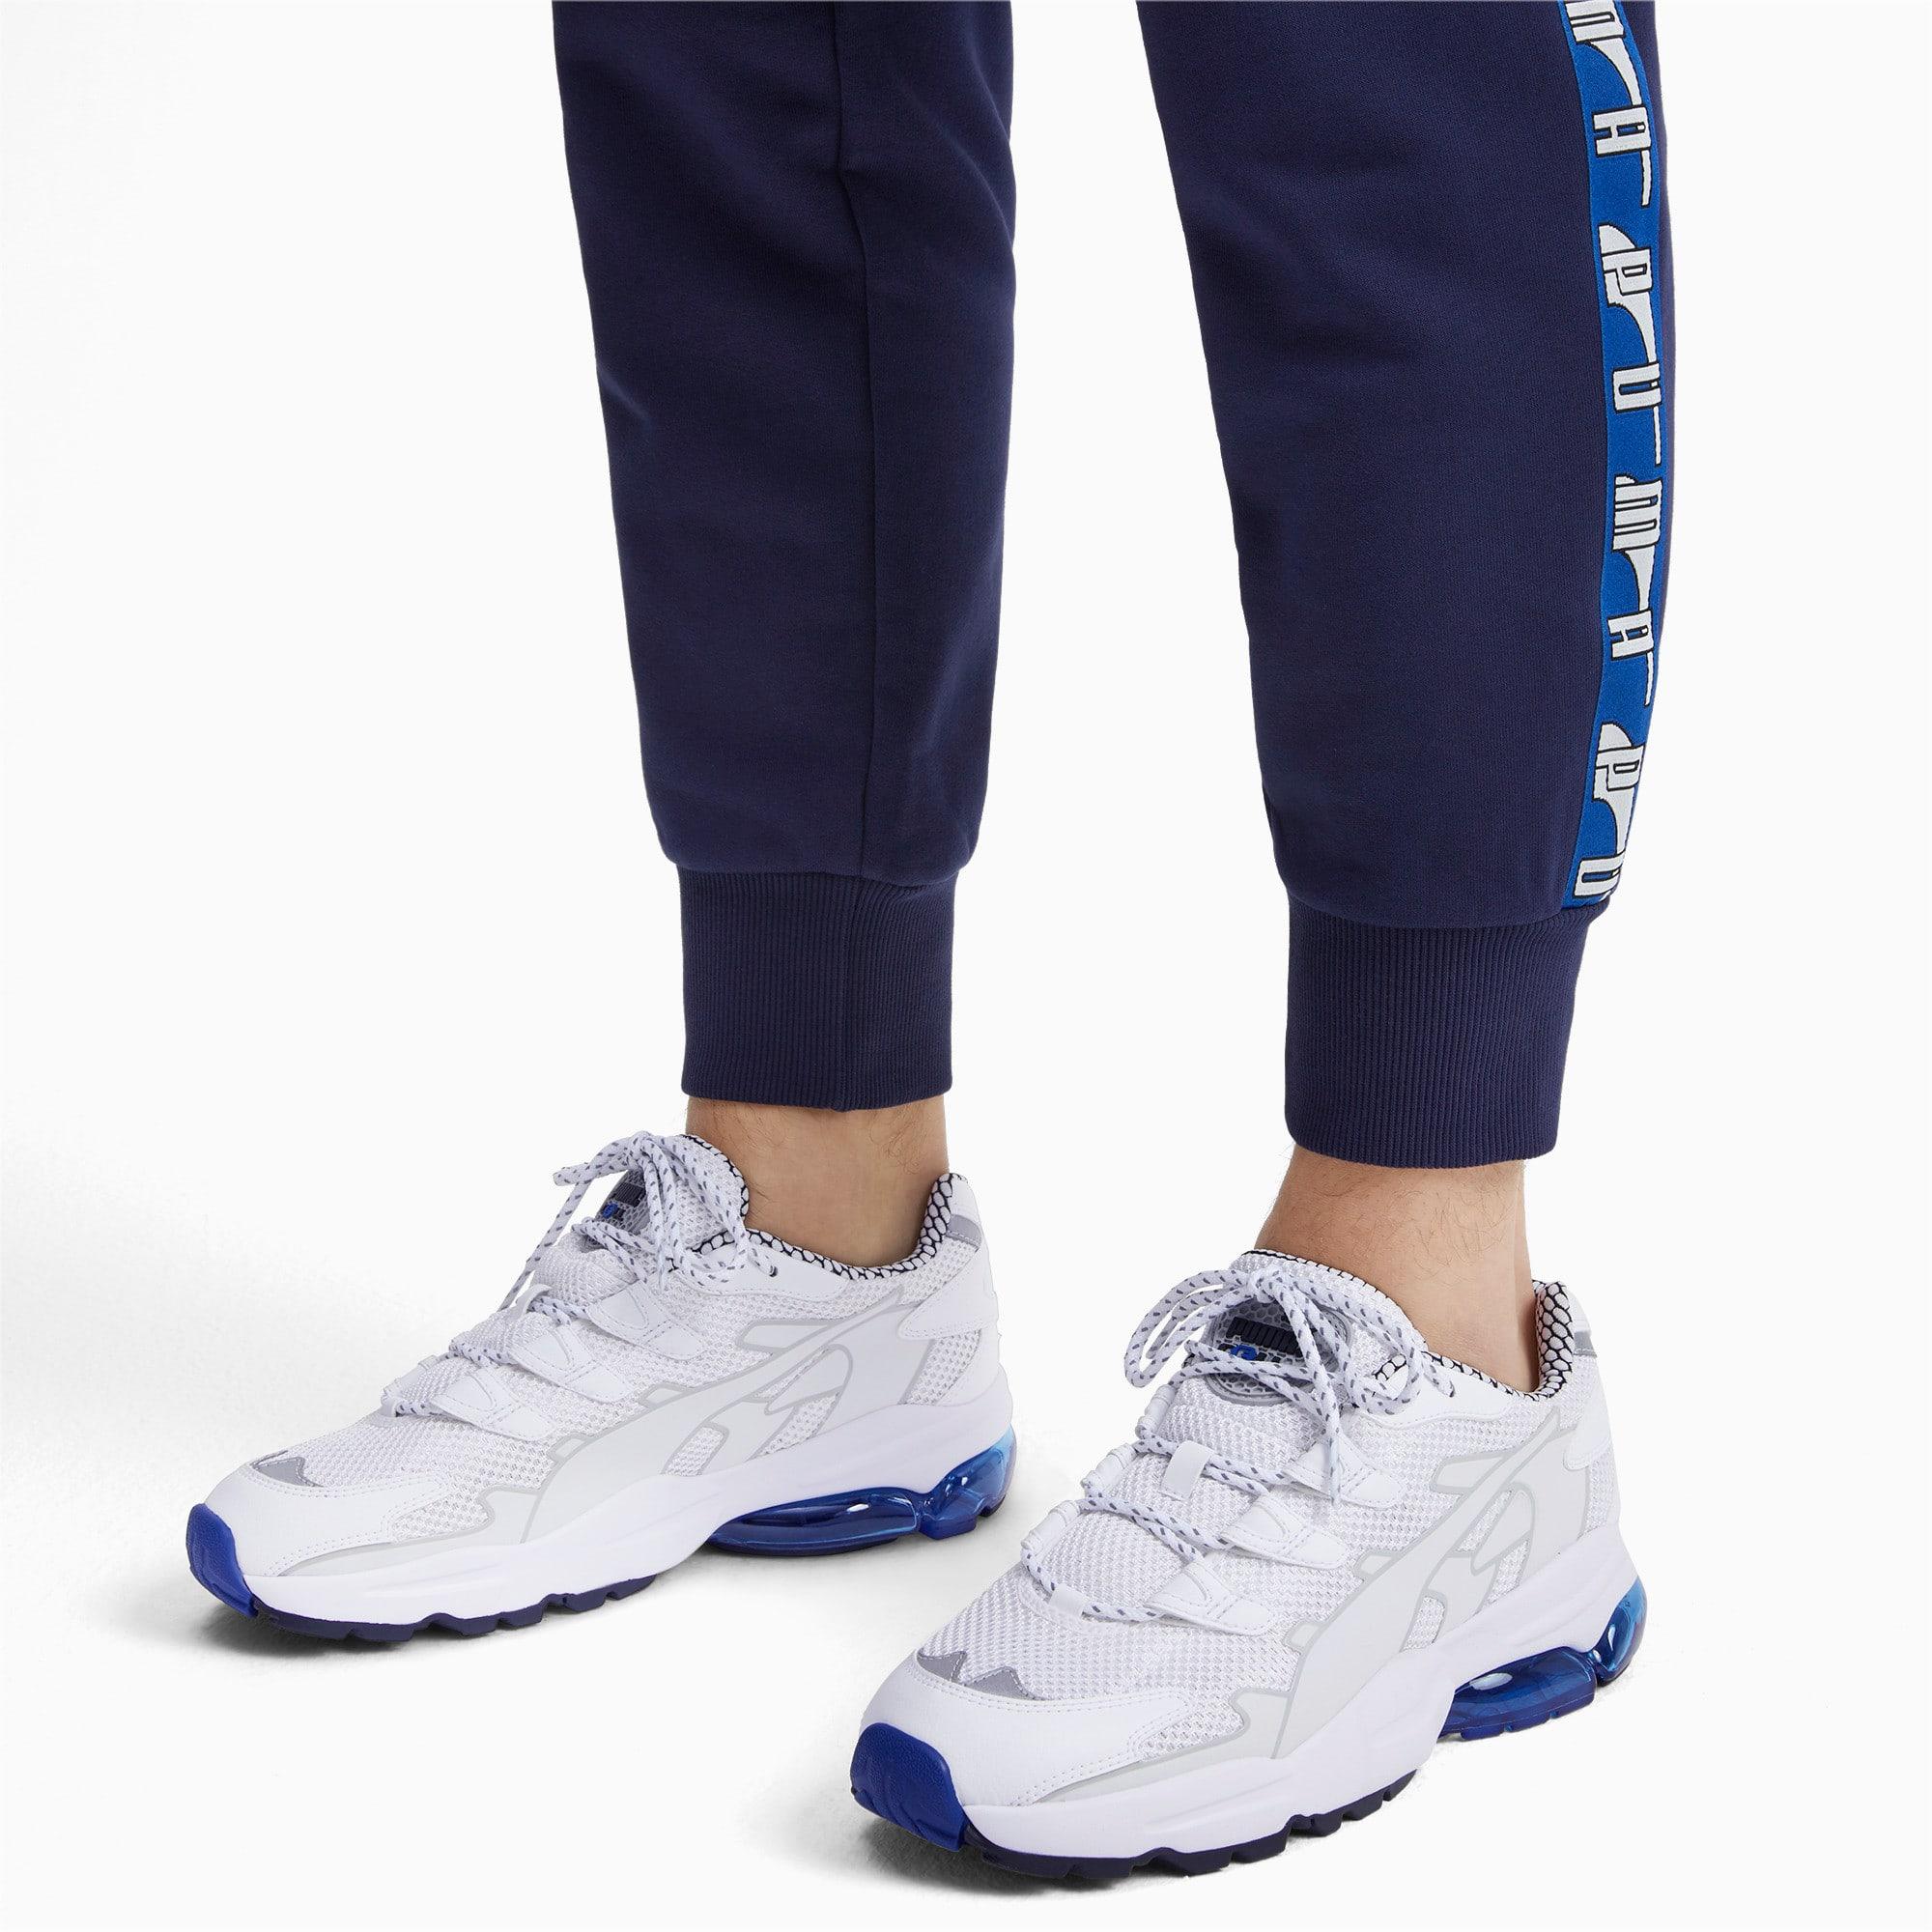 Miniatura 2 de Zapatos deportivos CELL Alien Kotto, Puma White-Puma White, mediano